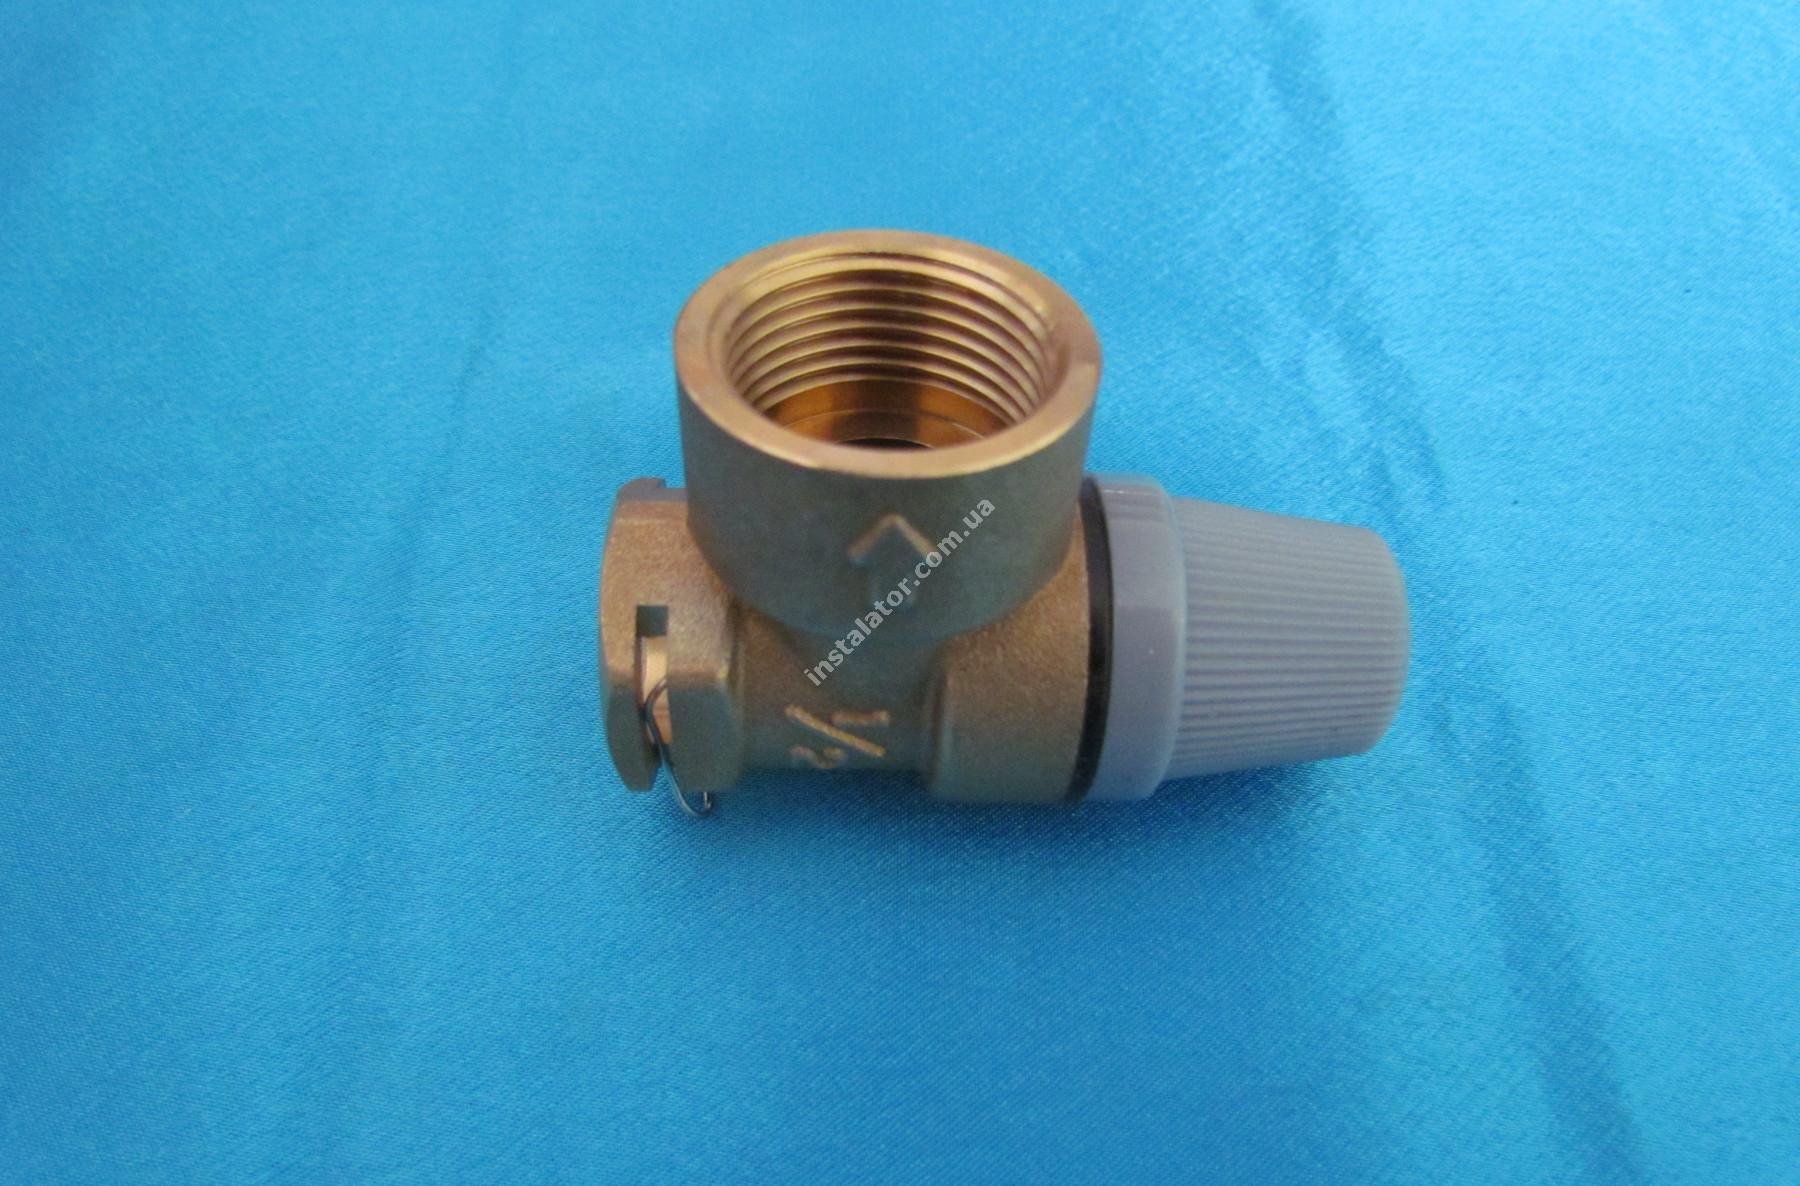 190732 (аналог) Запобіжний клапан  VAILLANT Pro/Plus 3 bar full-image-1